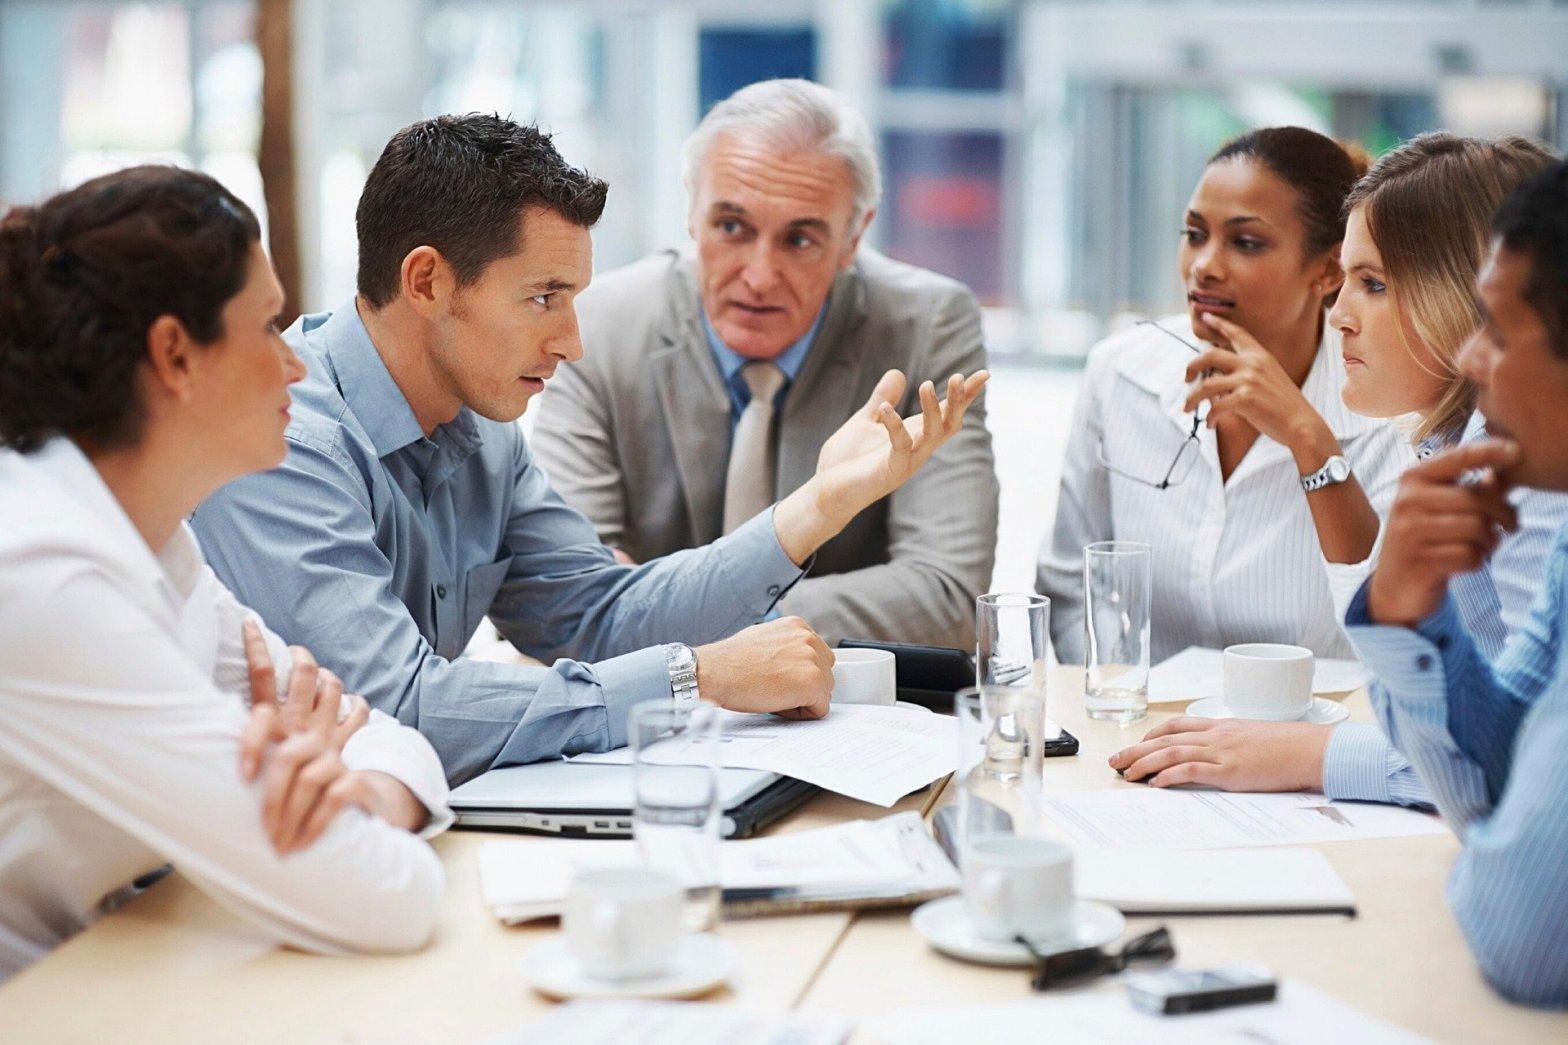 Unburden interior workplace designers, stop pointless meetings